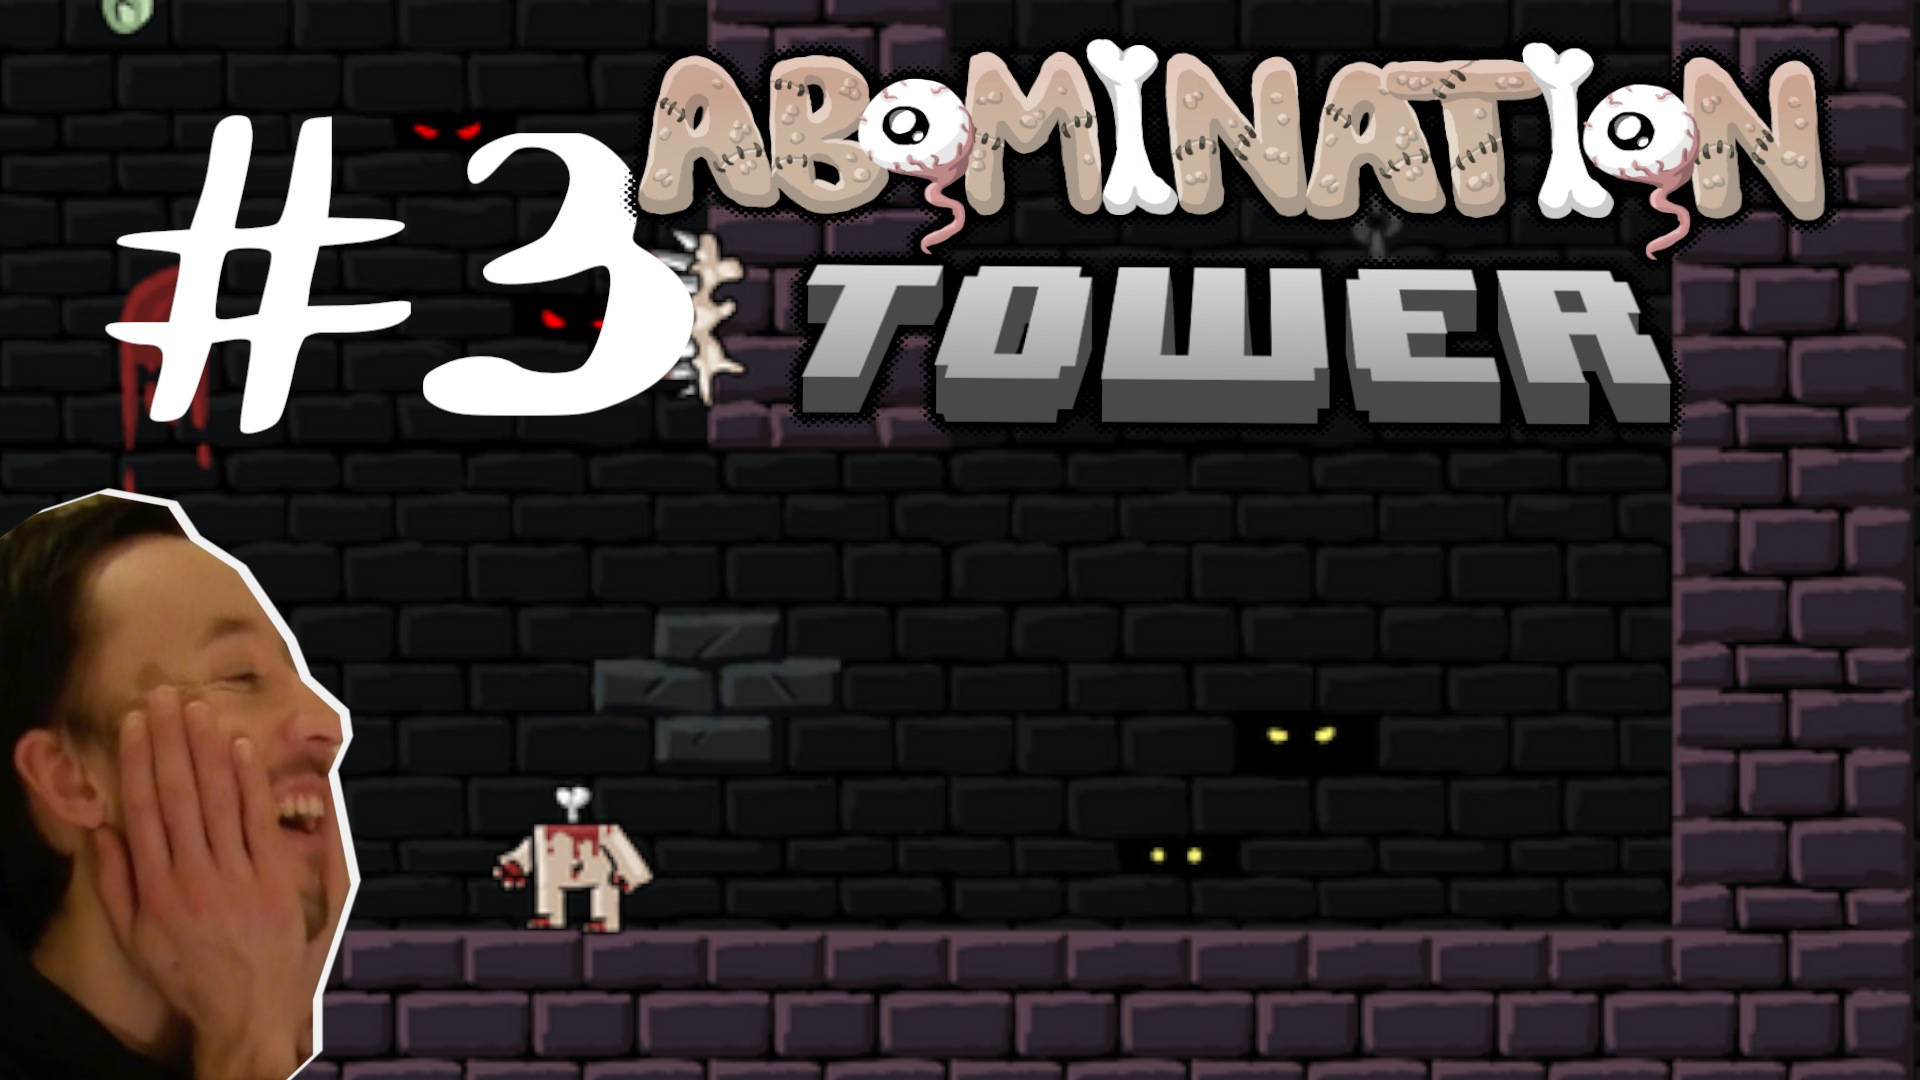 abomination-tower-part3.jpg